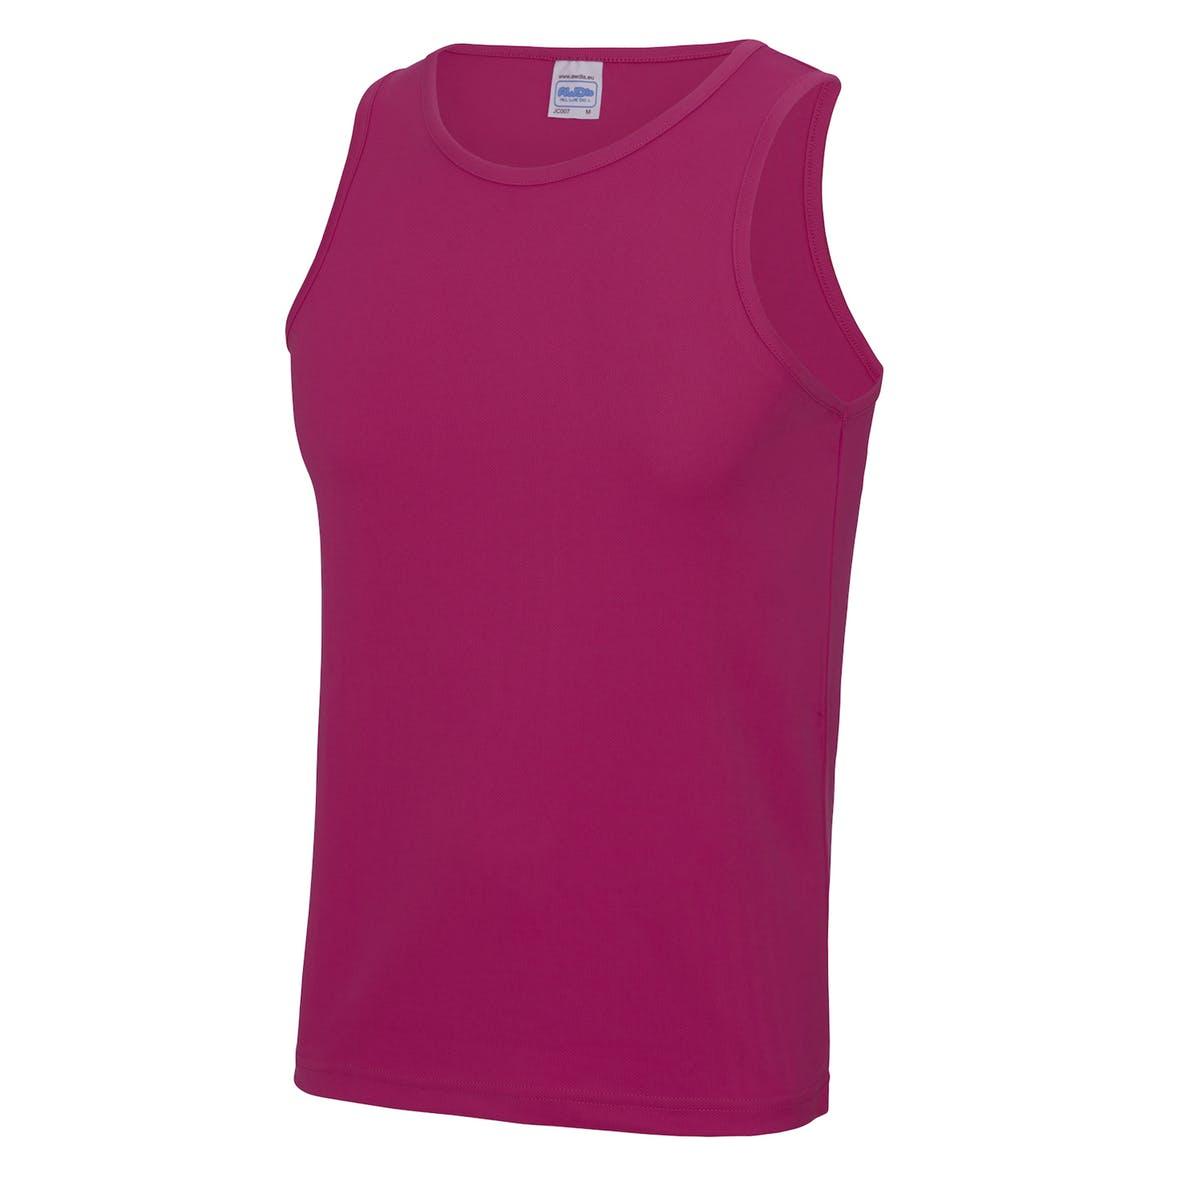 hot pink sports vest